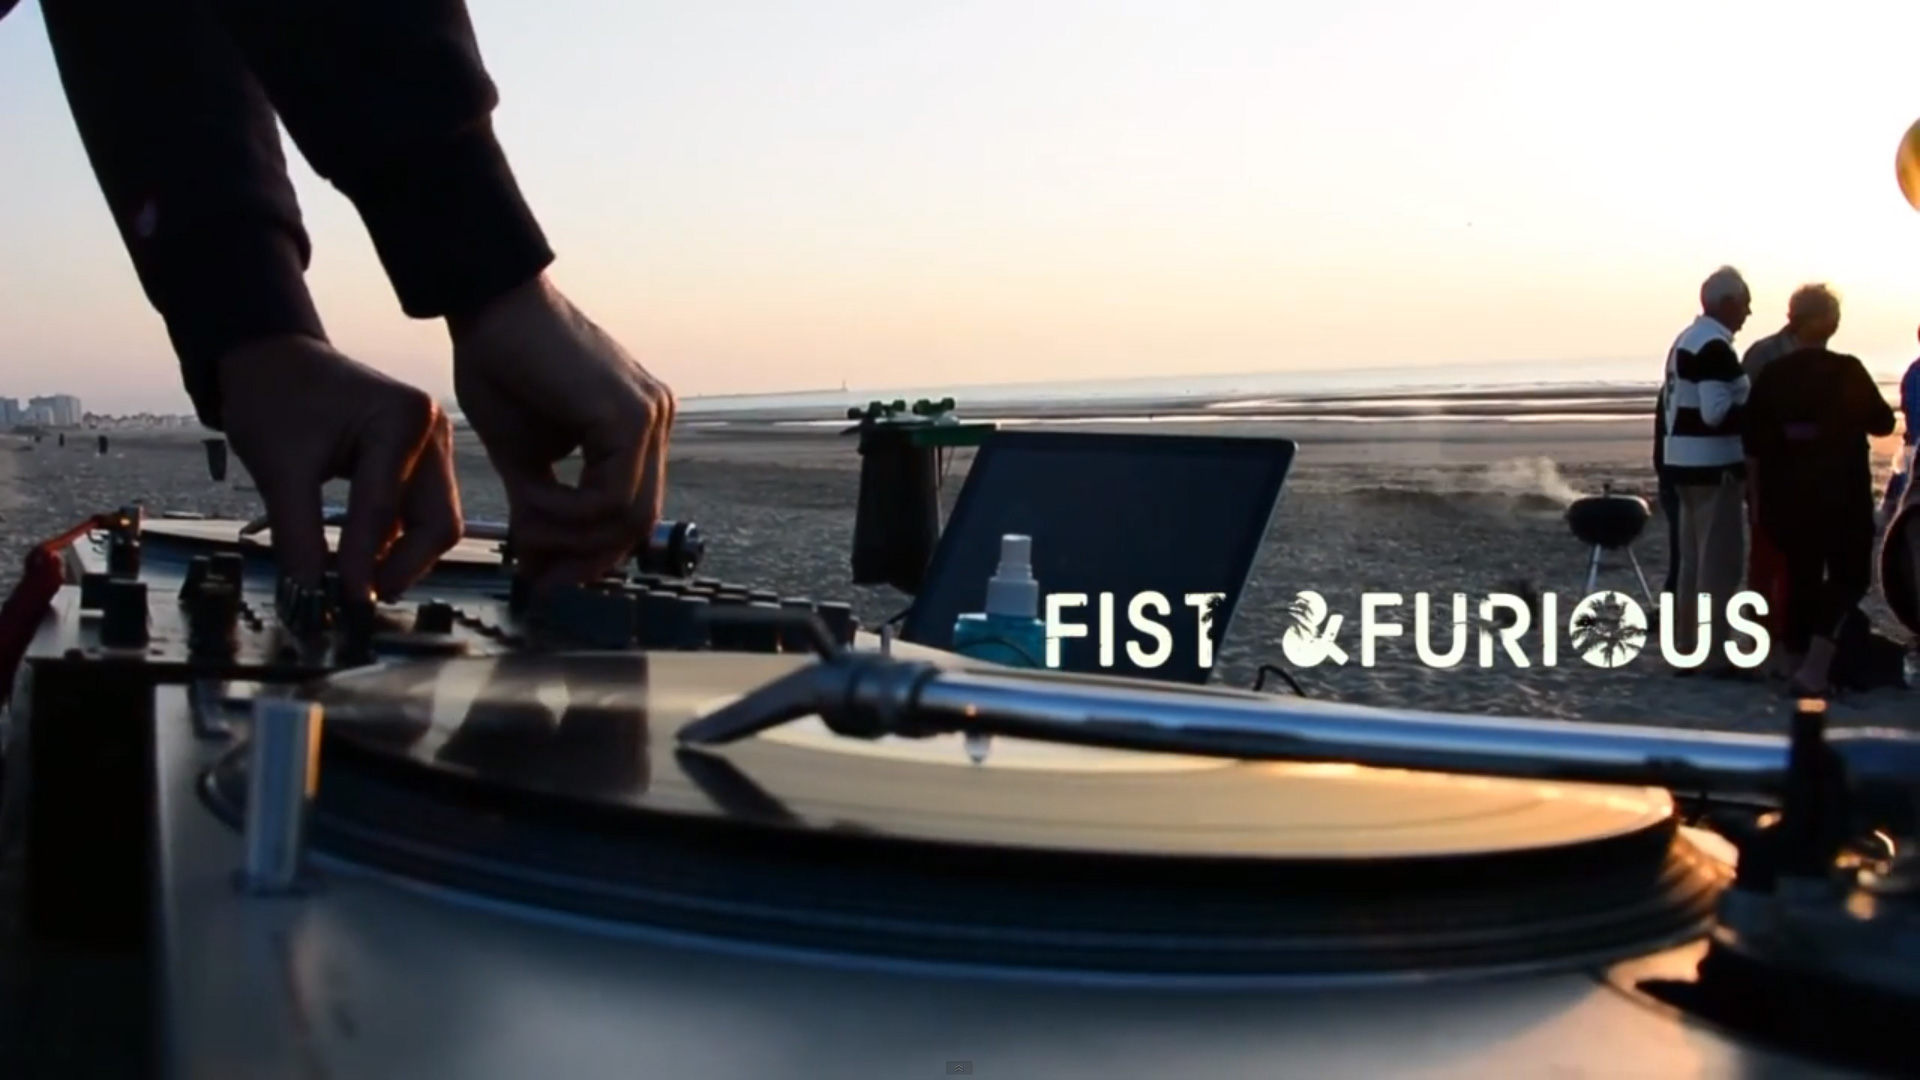 PTC Crew – Fist & Furious